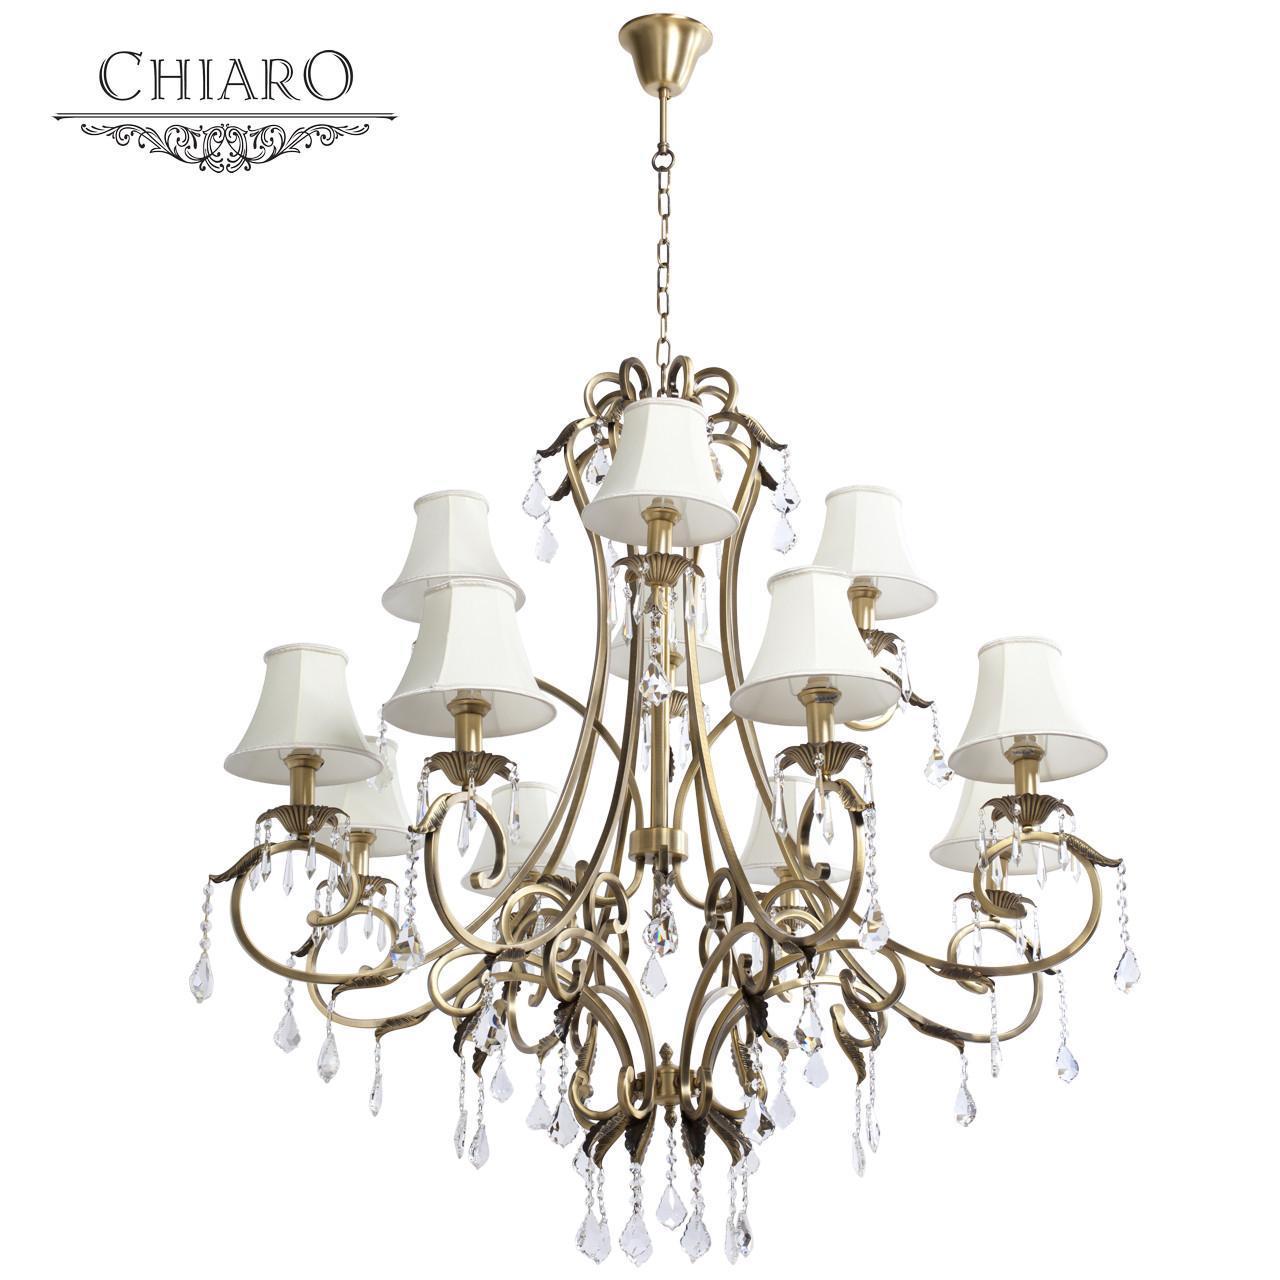 Люстра Chiaro София 355010612 подвесная chiaro подвесная люстра chiaro софия 355012008